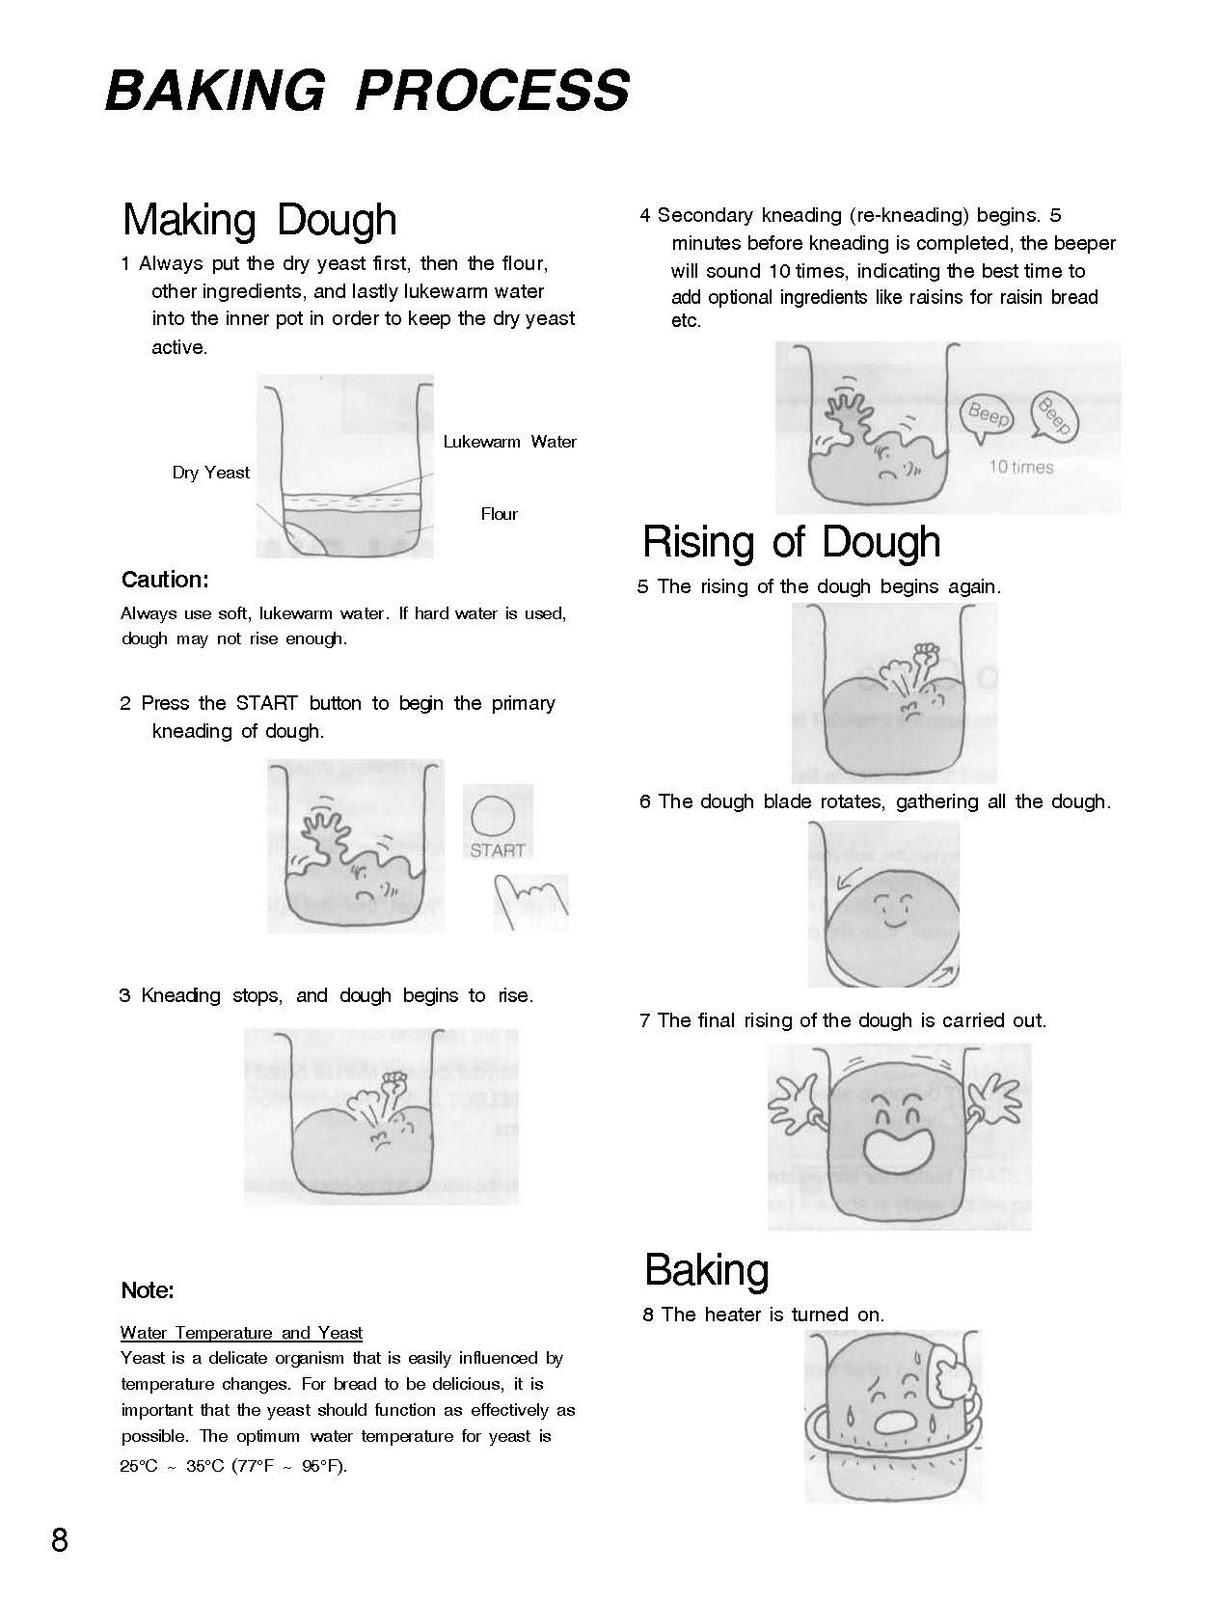 welbuilt bread machine manual